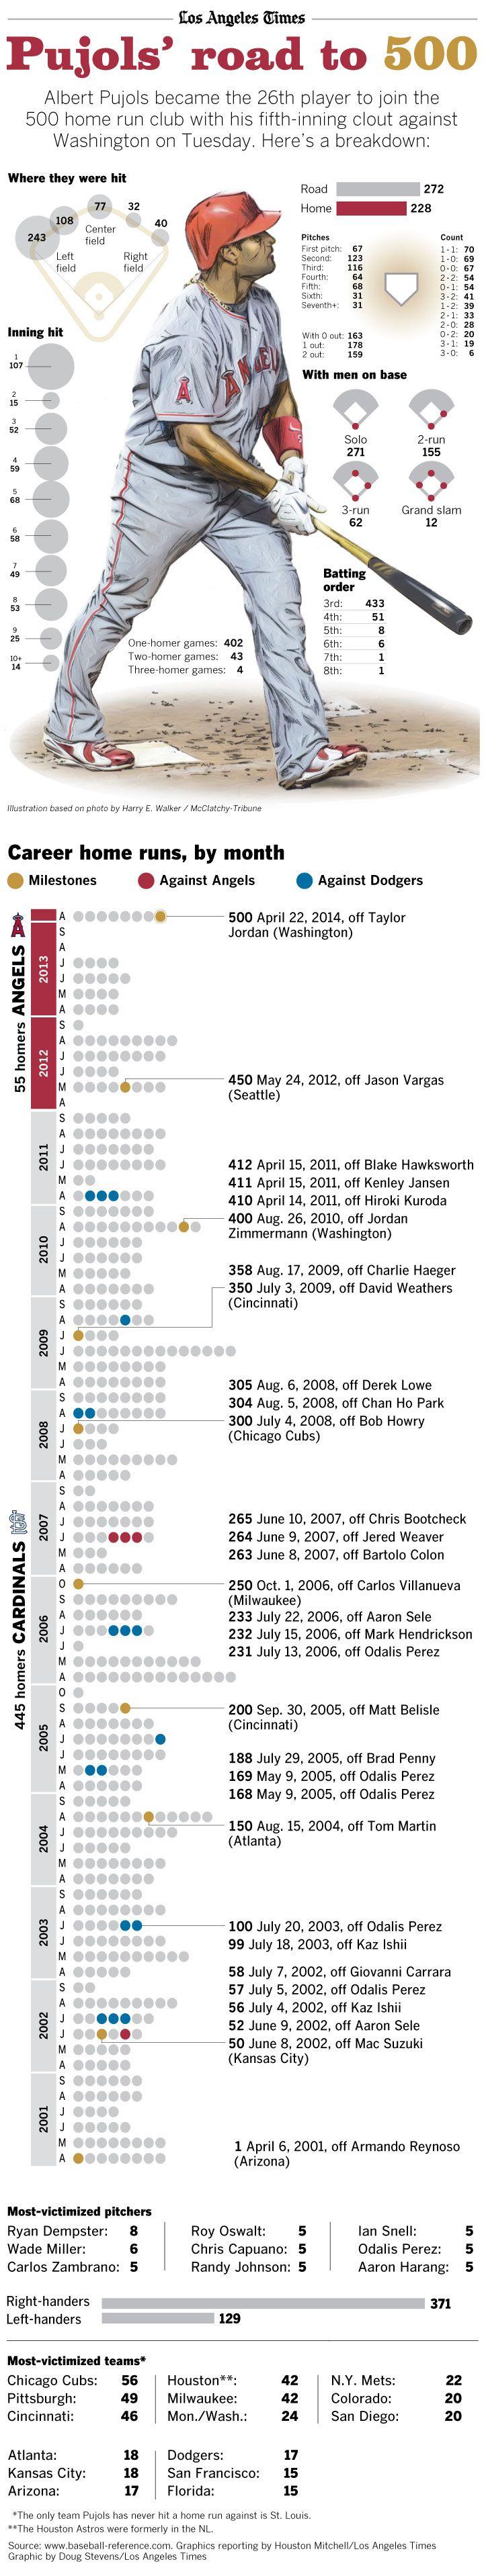 Infographic Albert Pujols' road to 500